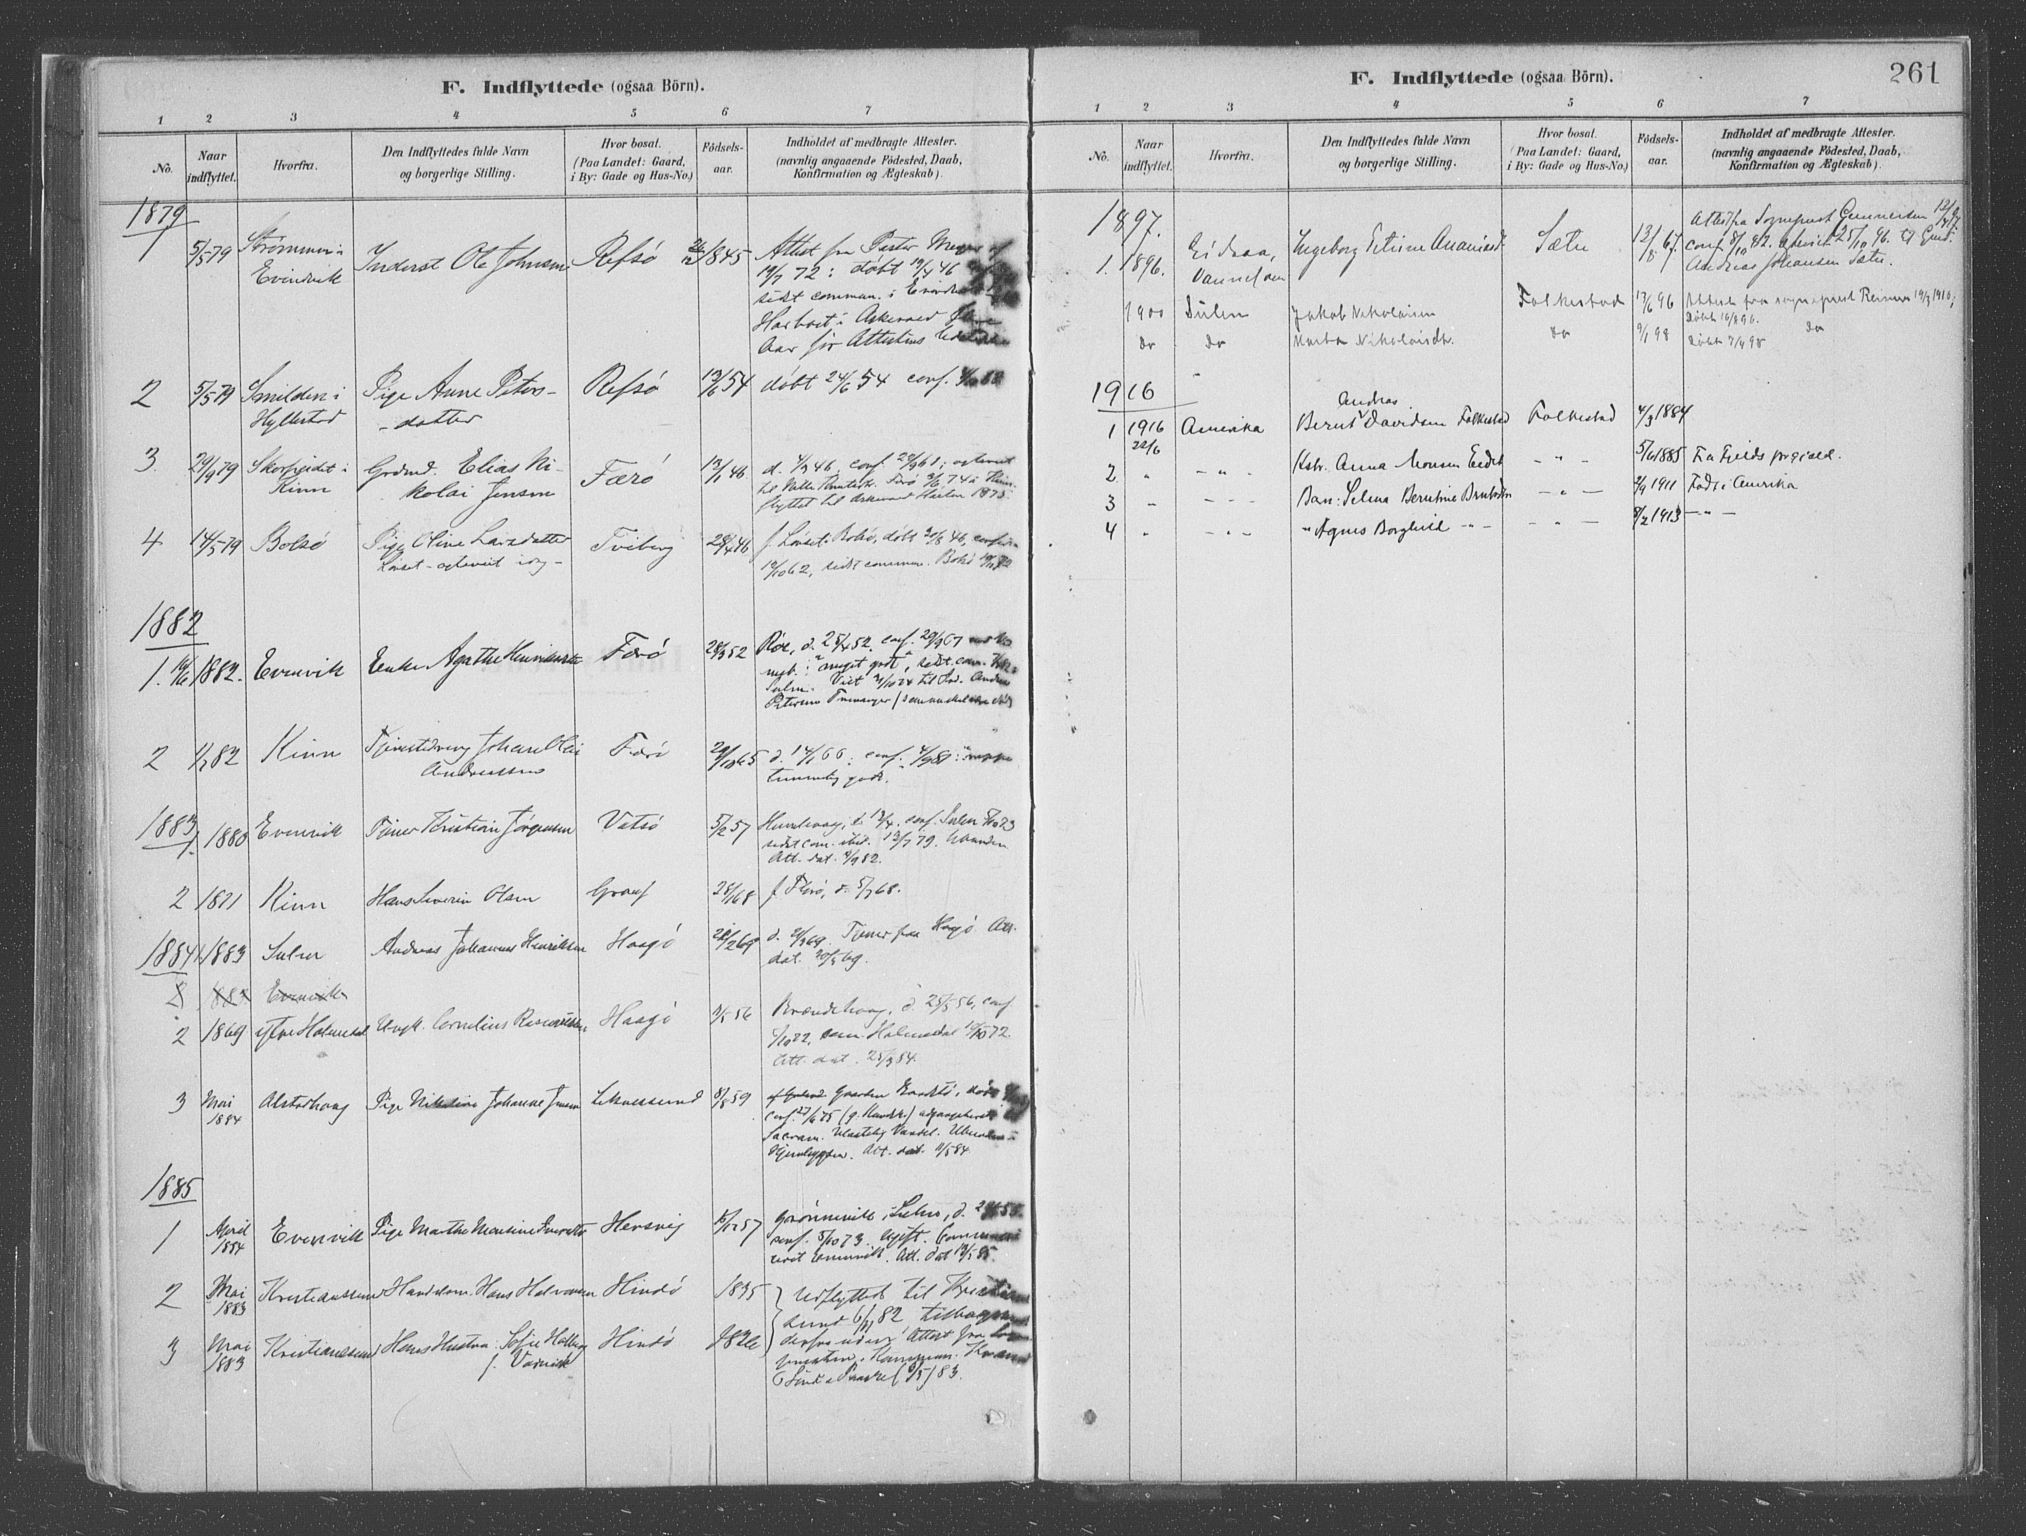 SAB, Askvoll sokneprestembete, H/Haa/Haac/L0001: Ministerialbok nr. C  1, 1879-1922, s. 261